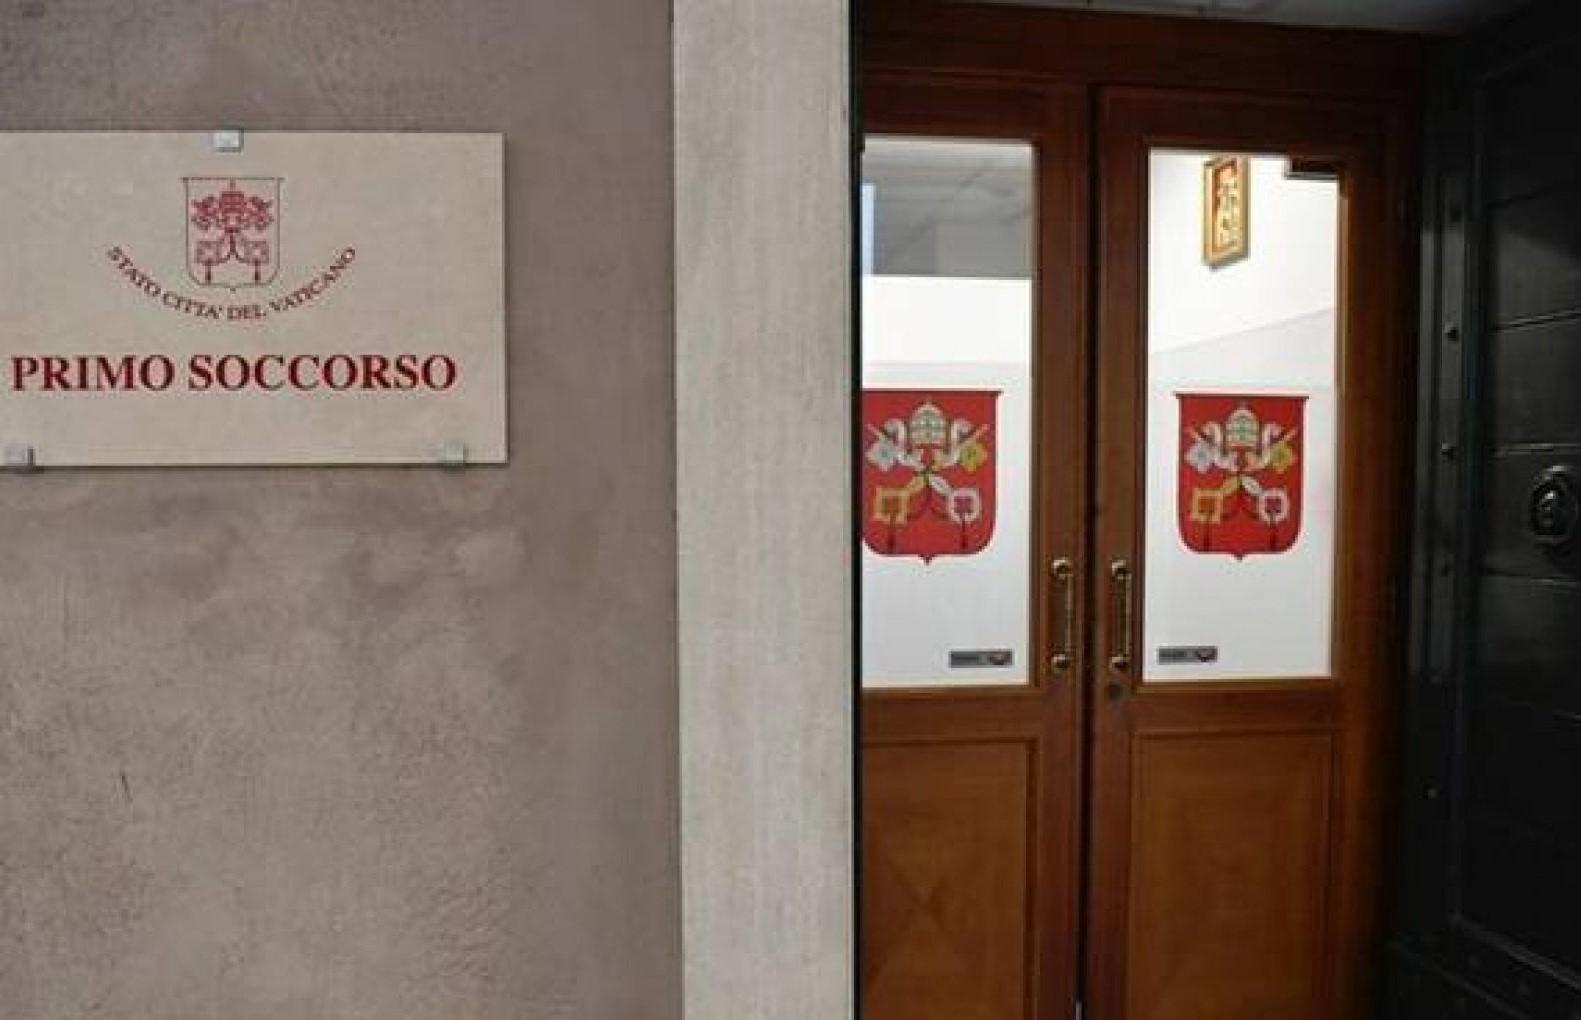 papa francesco seconda dose vaccino covid pfizer vaticano